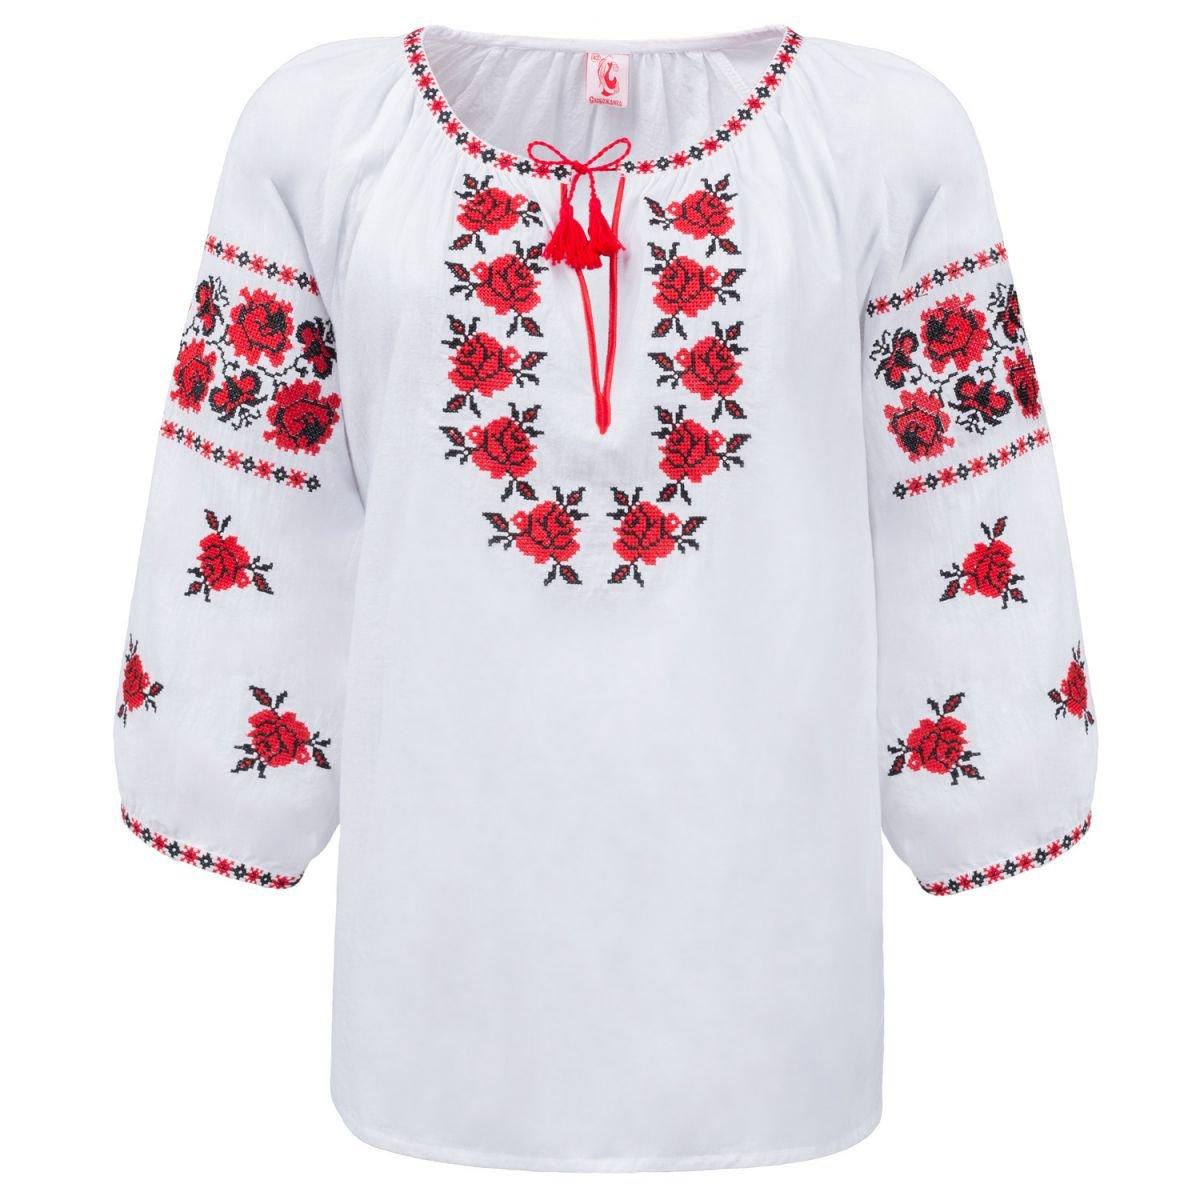 Женская блуза вышиванка Слобожанка - Ружа 44 20b95f8b5e9ce